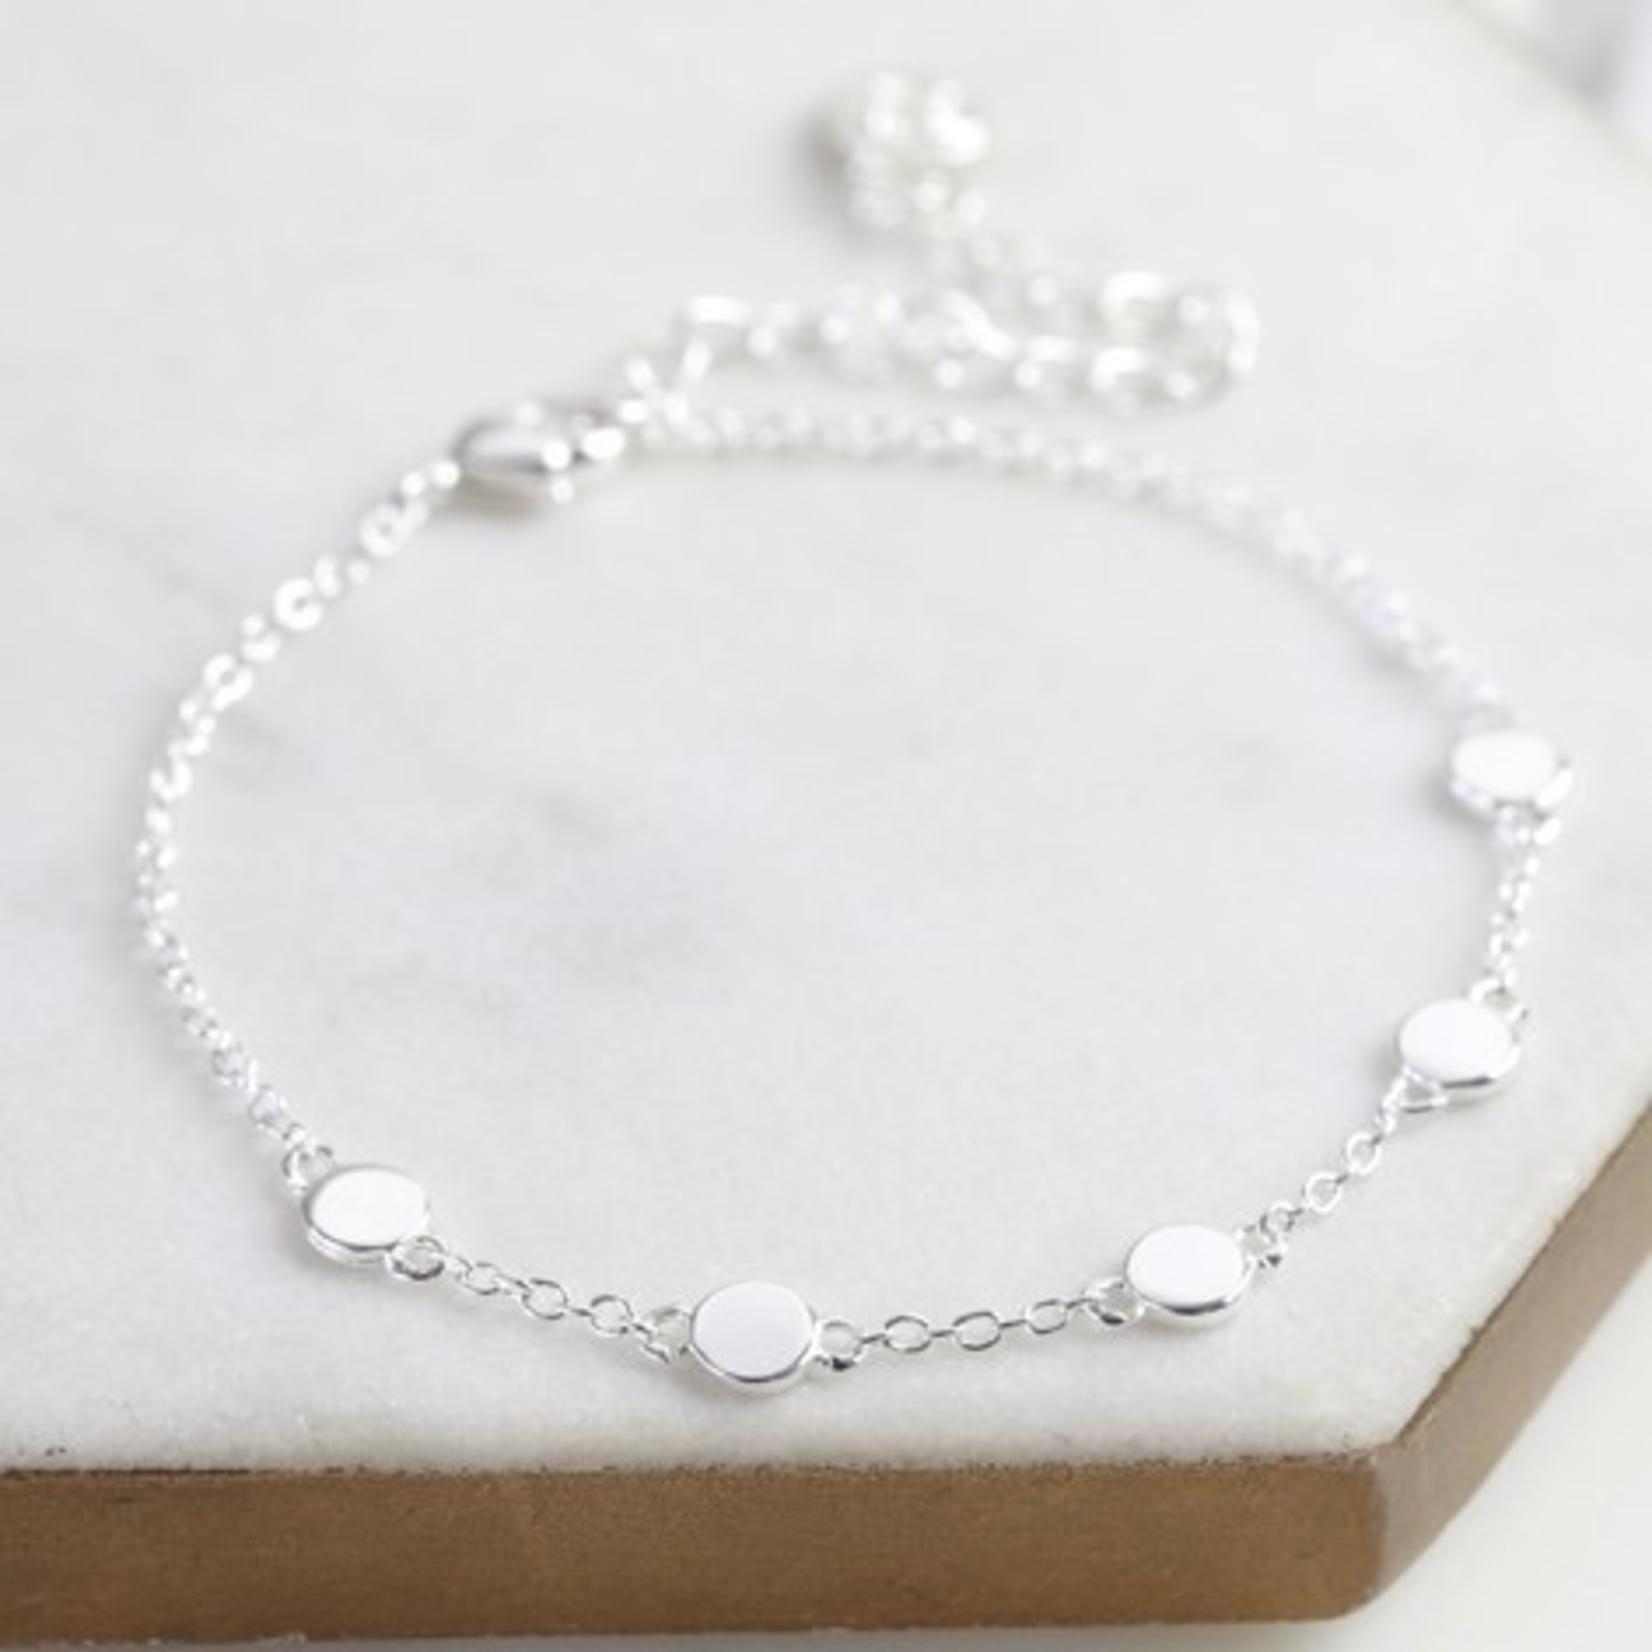 Lisa Angel Circle Charms Bracelet in Silver